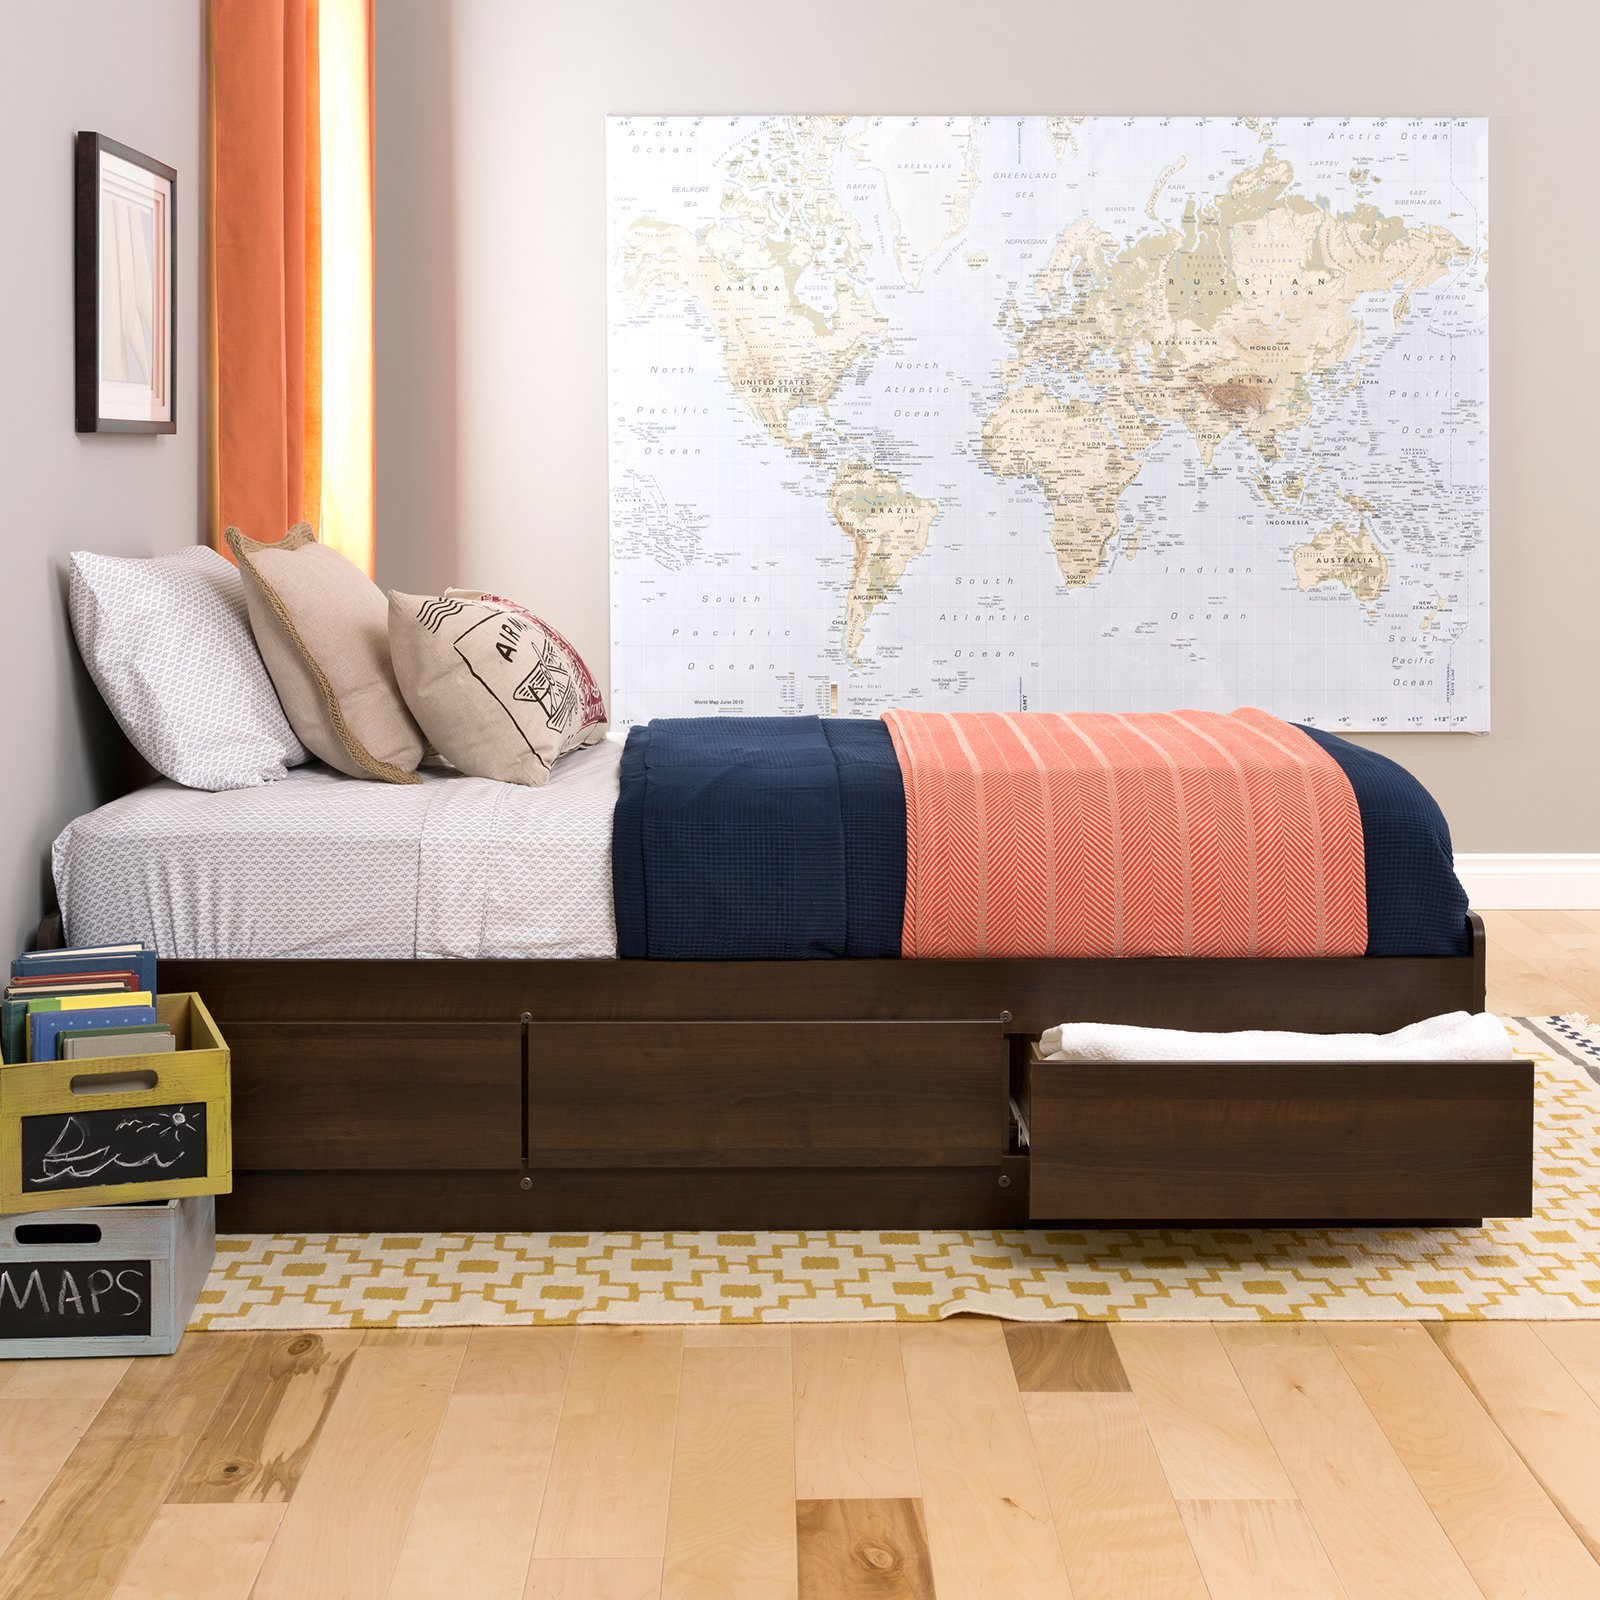 Edenvale Twin Platform Storage Bed, Espresso (Box 1 of 2) by Prepac